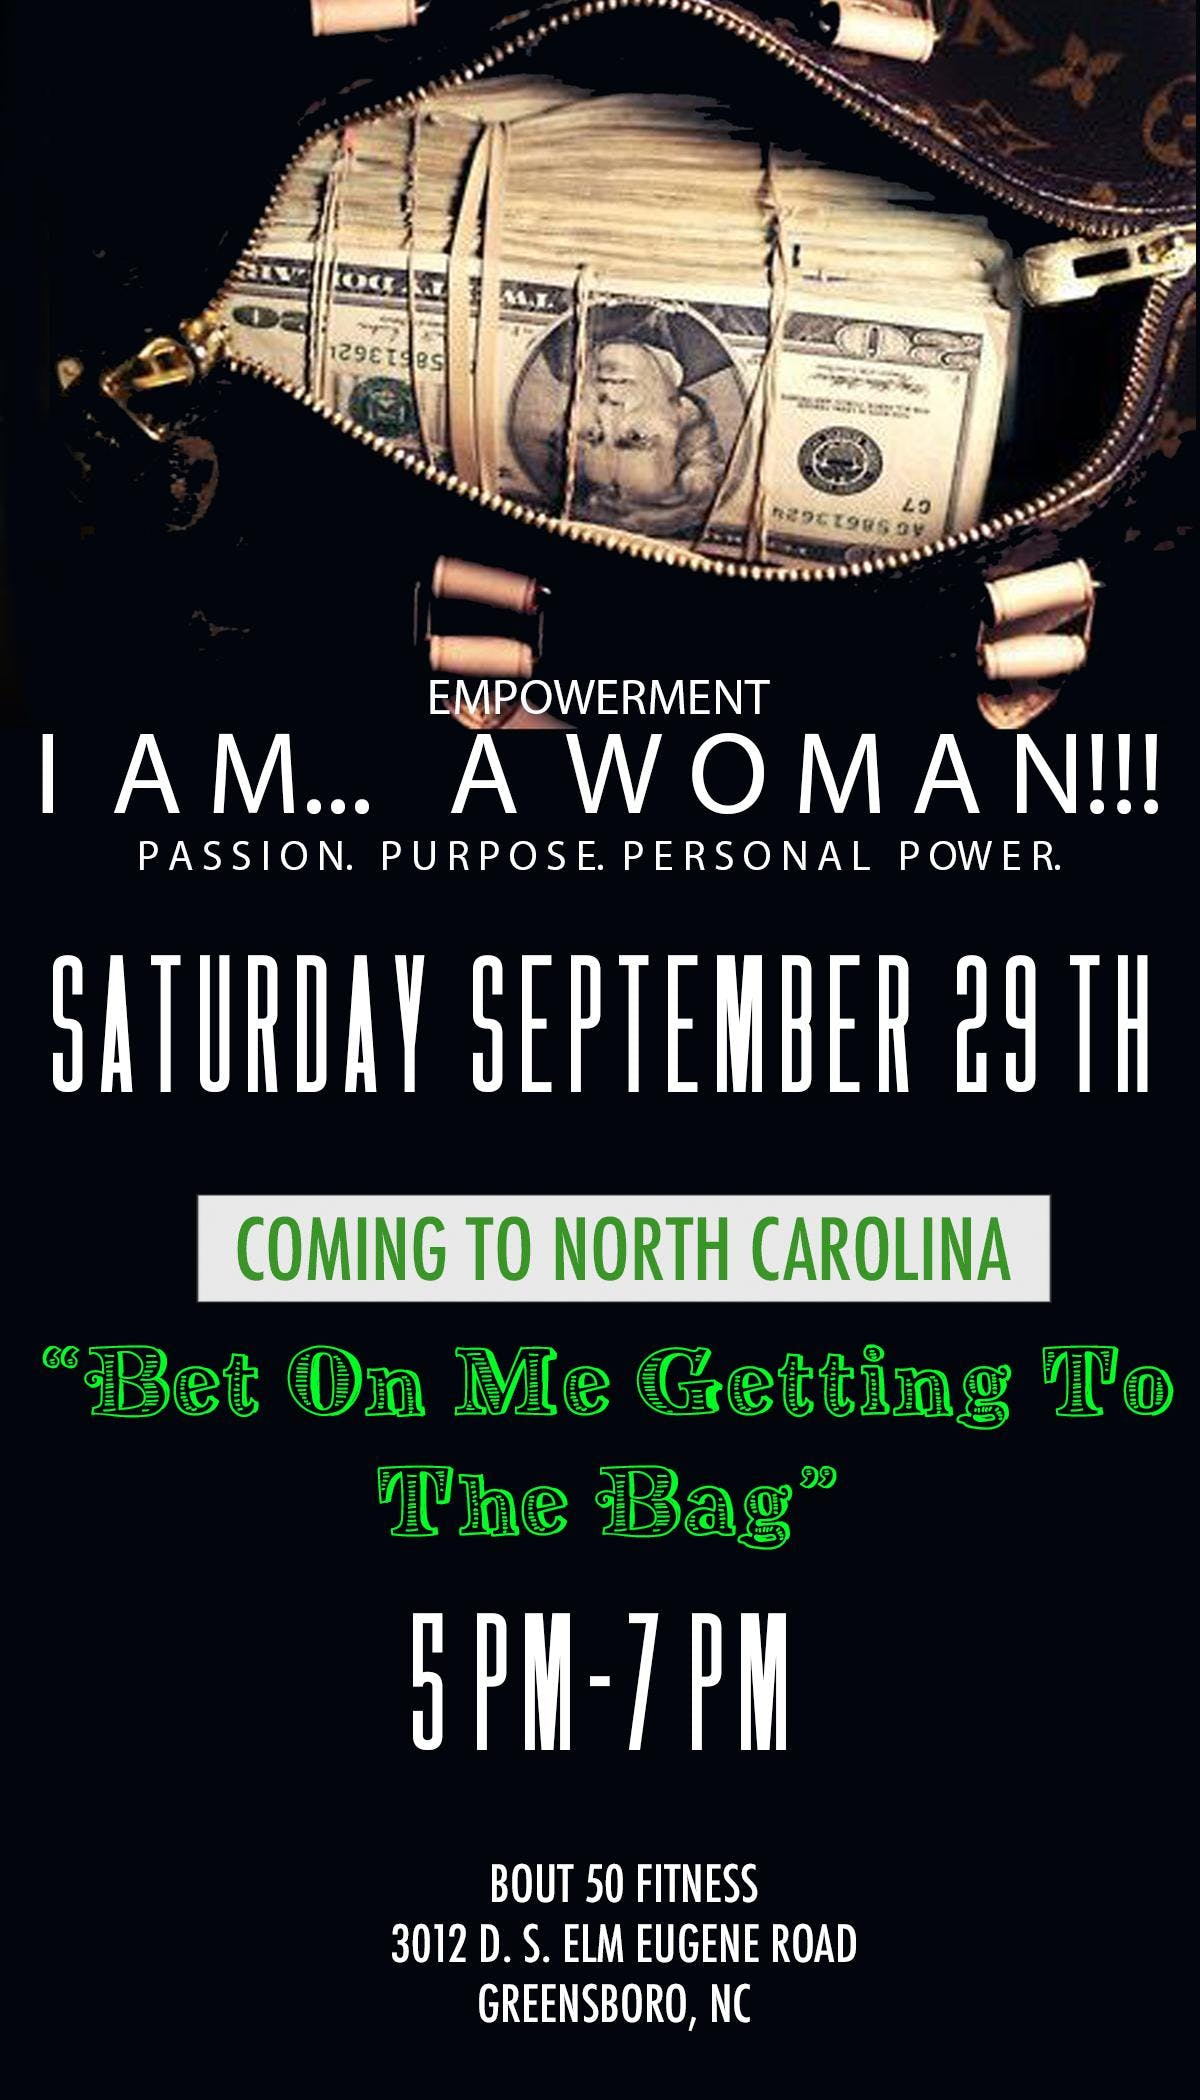 I AM... A WOMAN!!! Empowerment